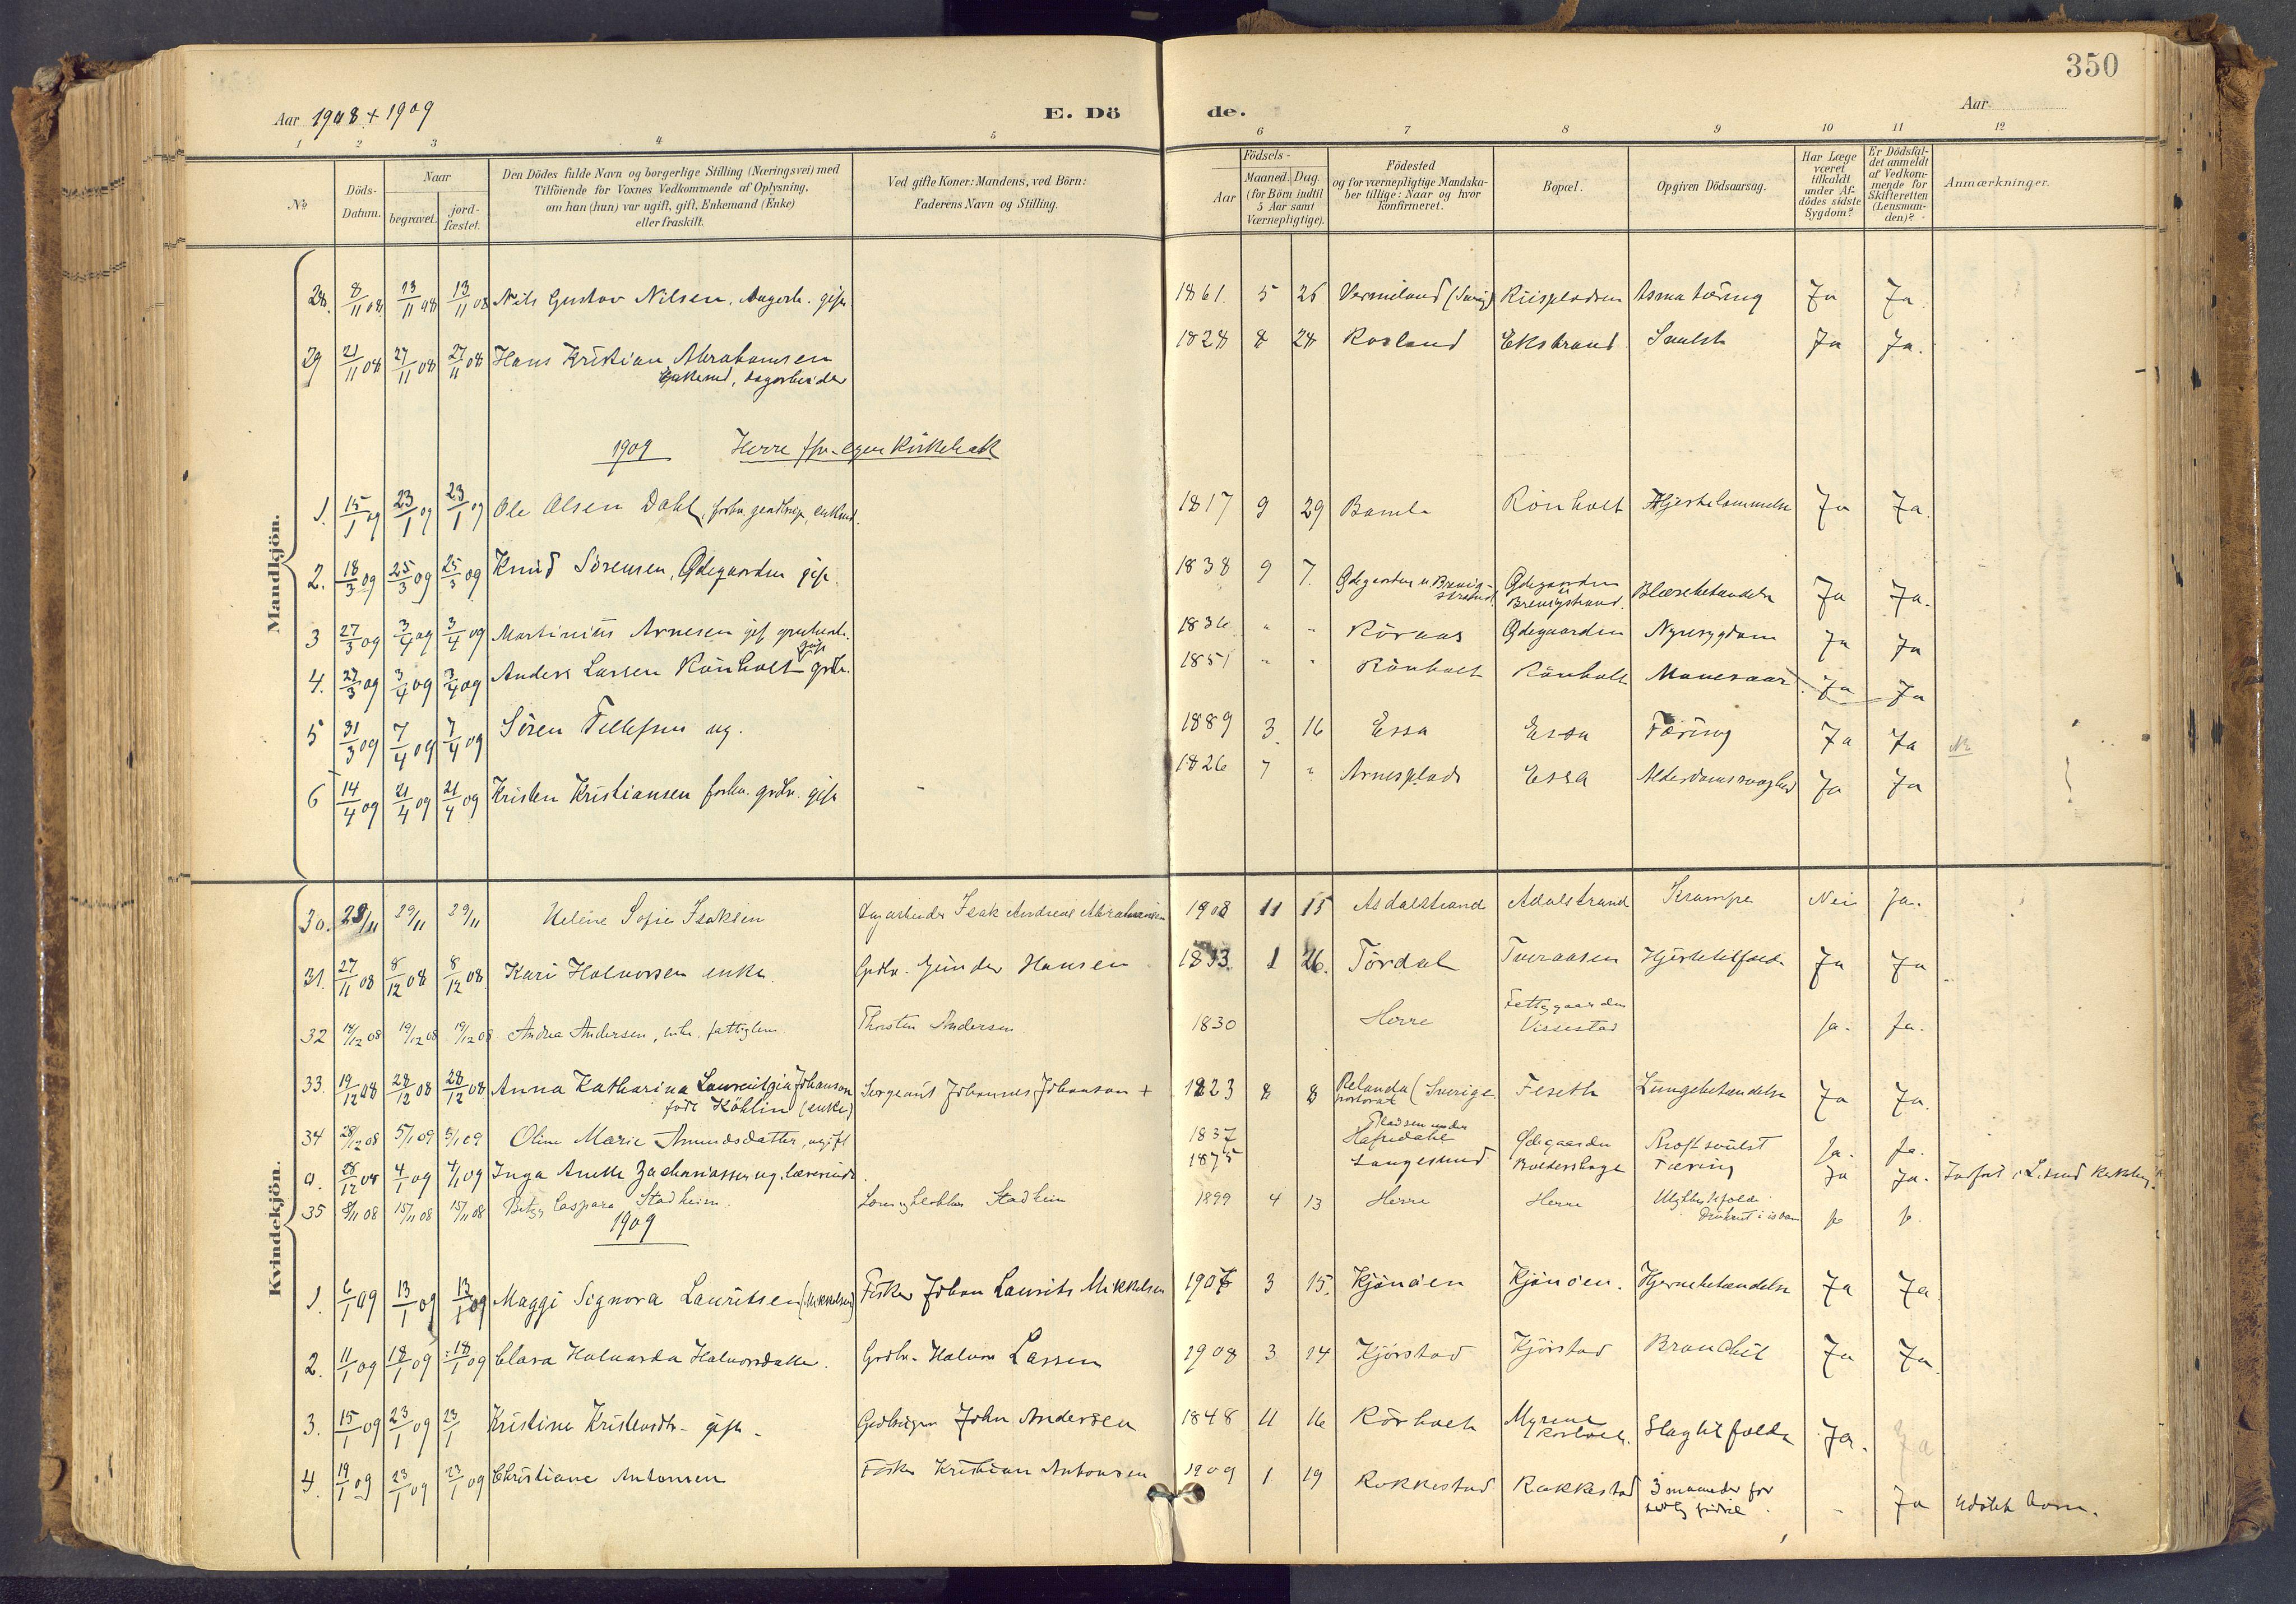 SAKO, Bamble kirkebøker, F/Fa/L0009: Ministerialbok nr. I 9, 1901-1917, s. 350